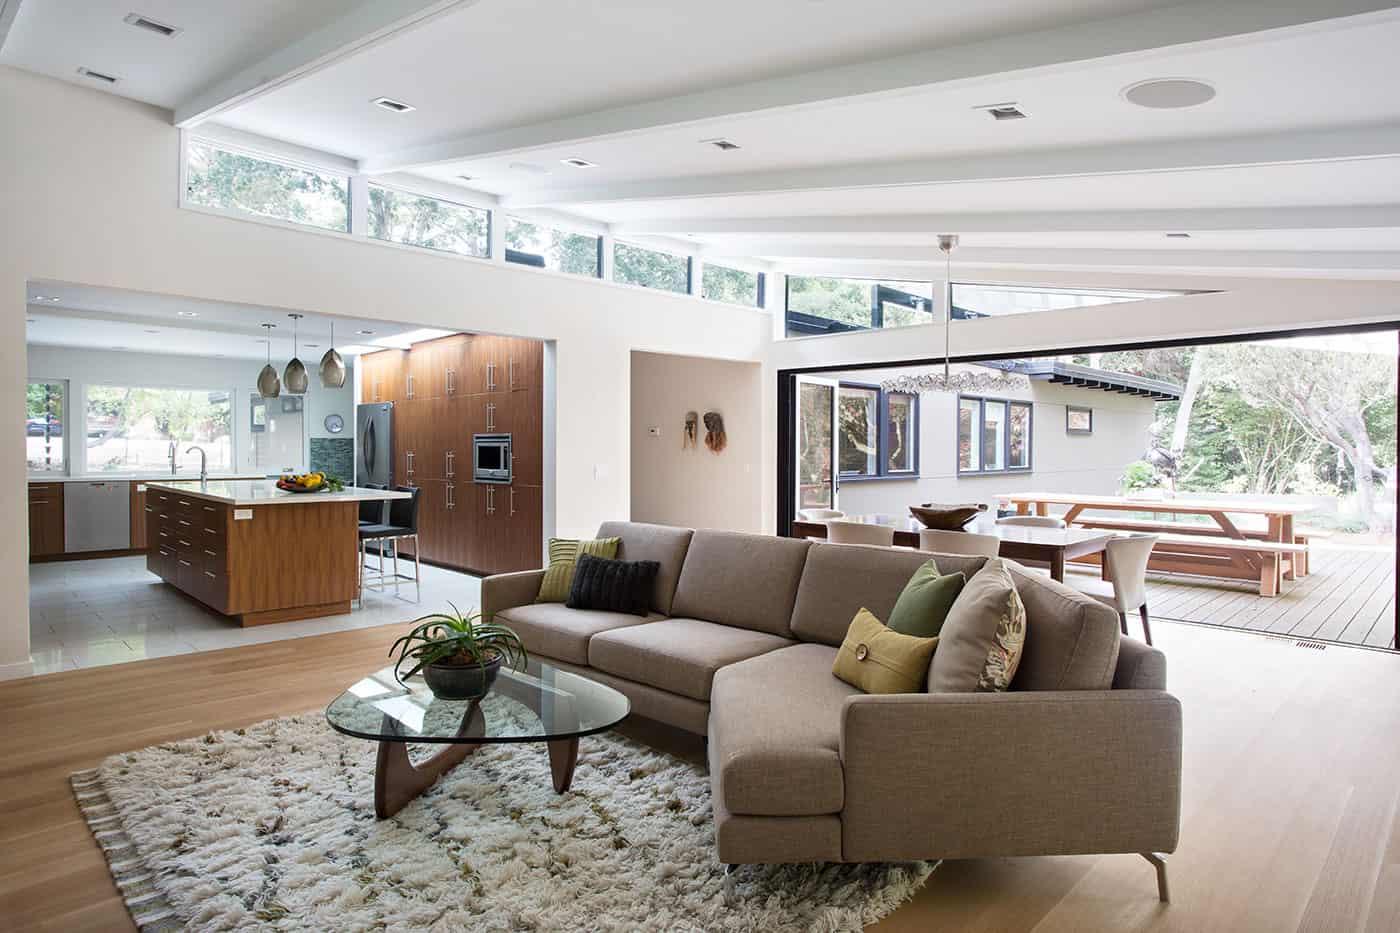 Mcm Design architecture renovate a residence in lafayette california